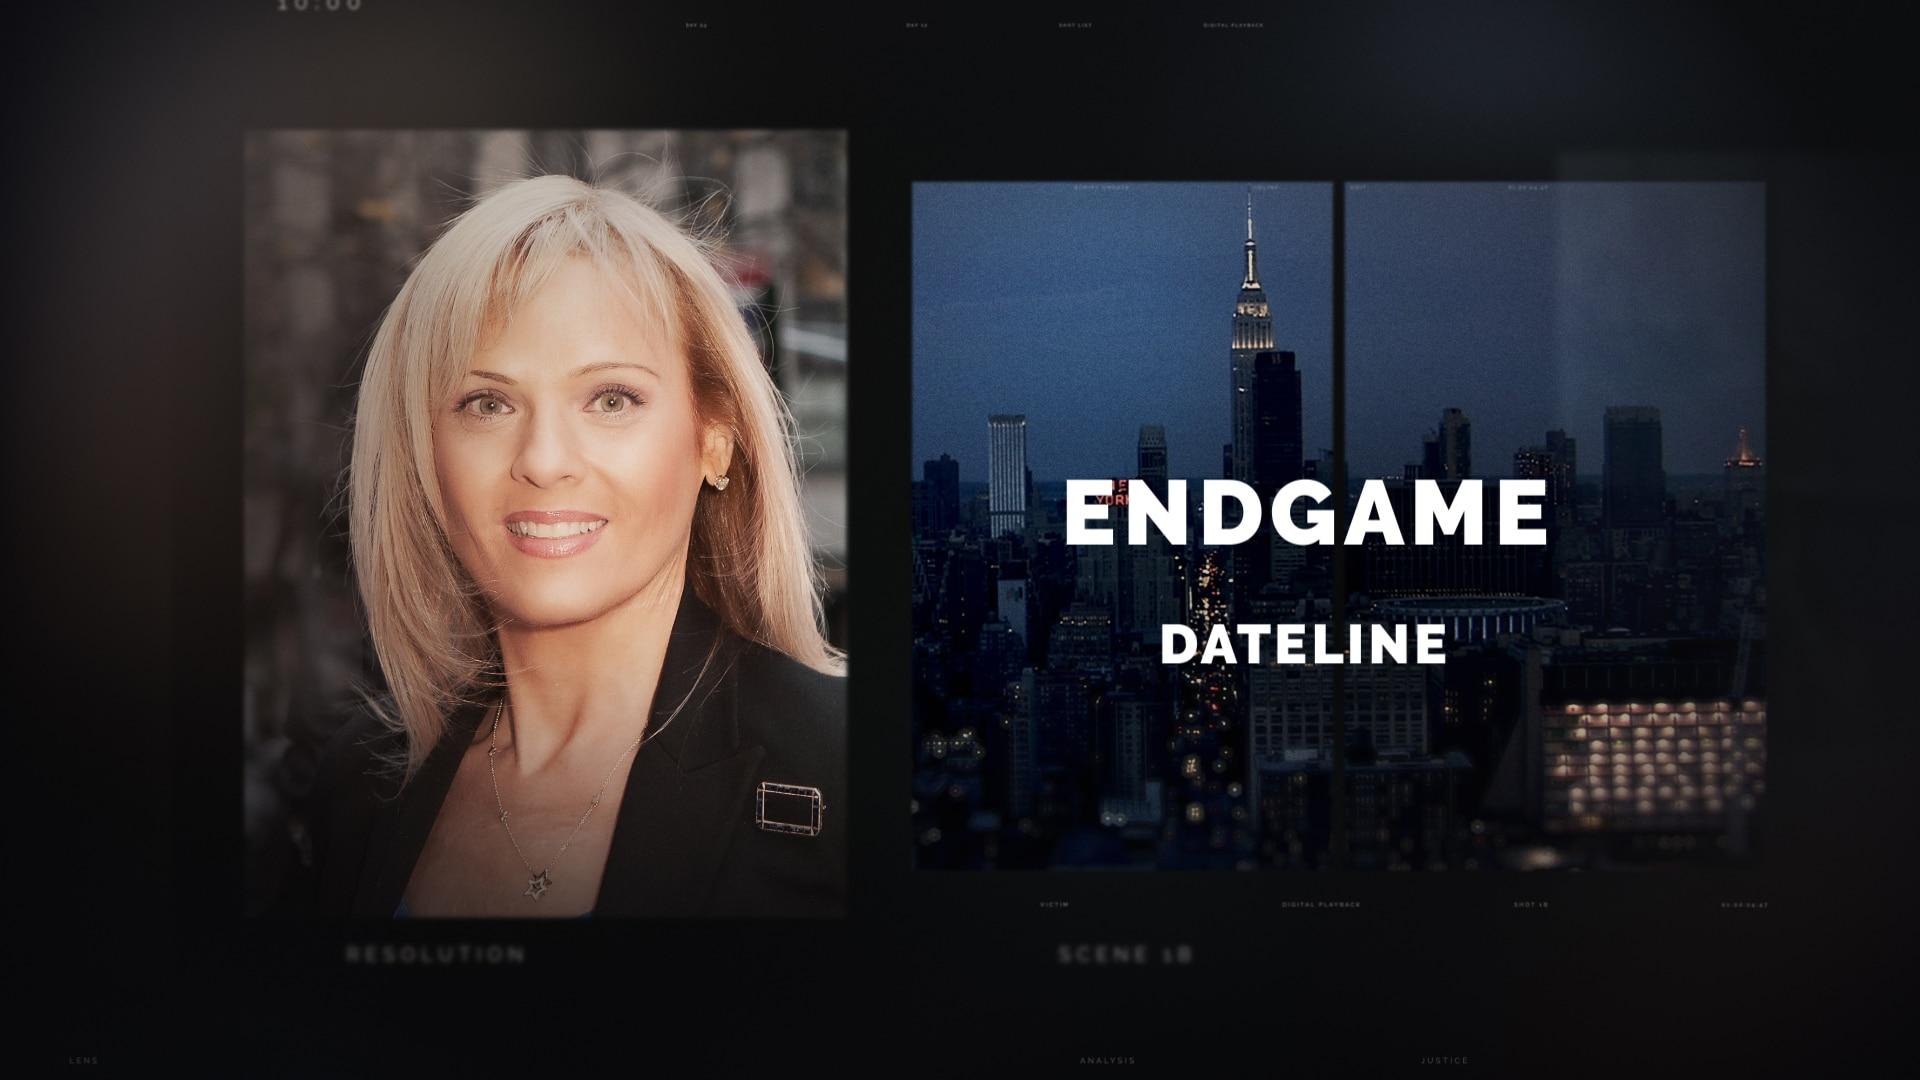 Watch Dateline Episode: Endgame - NBC.com